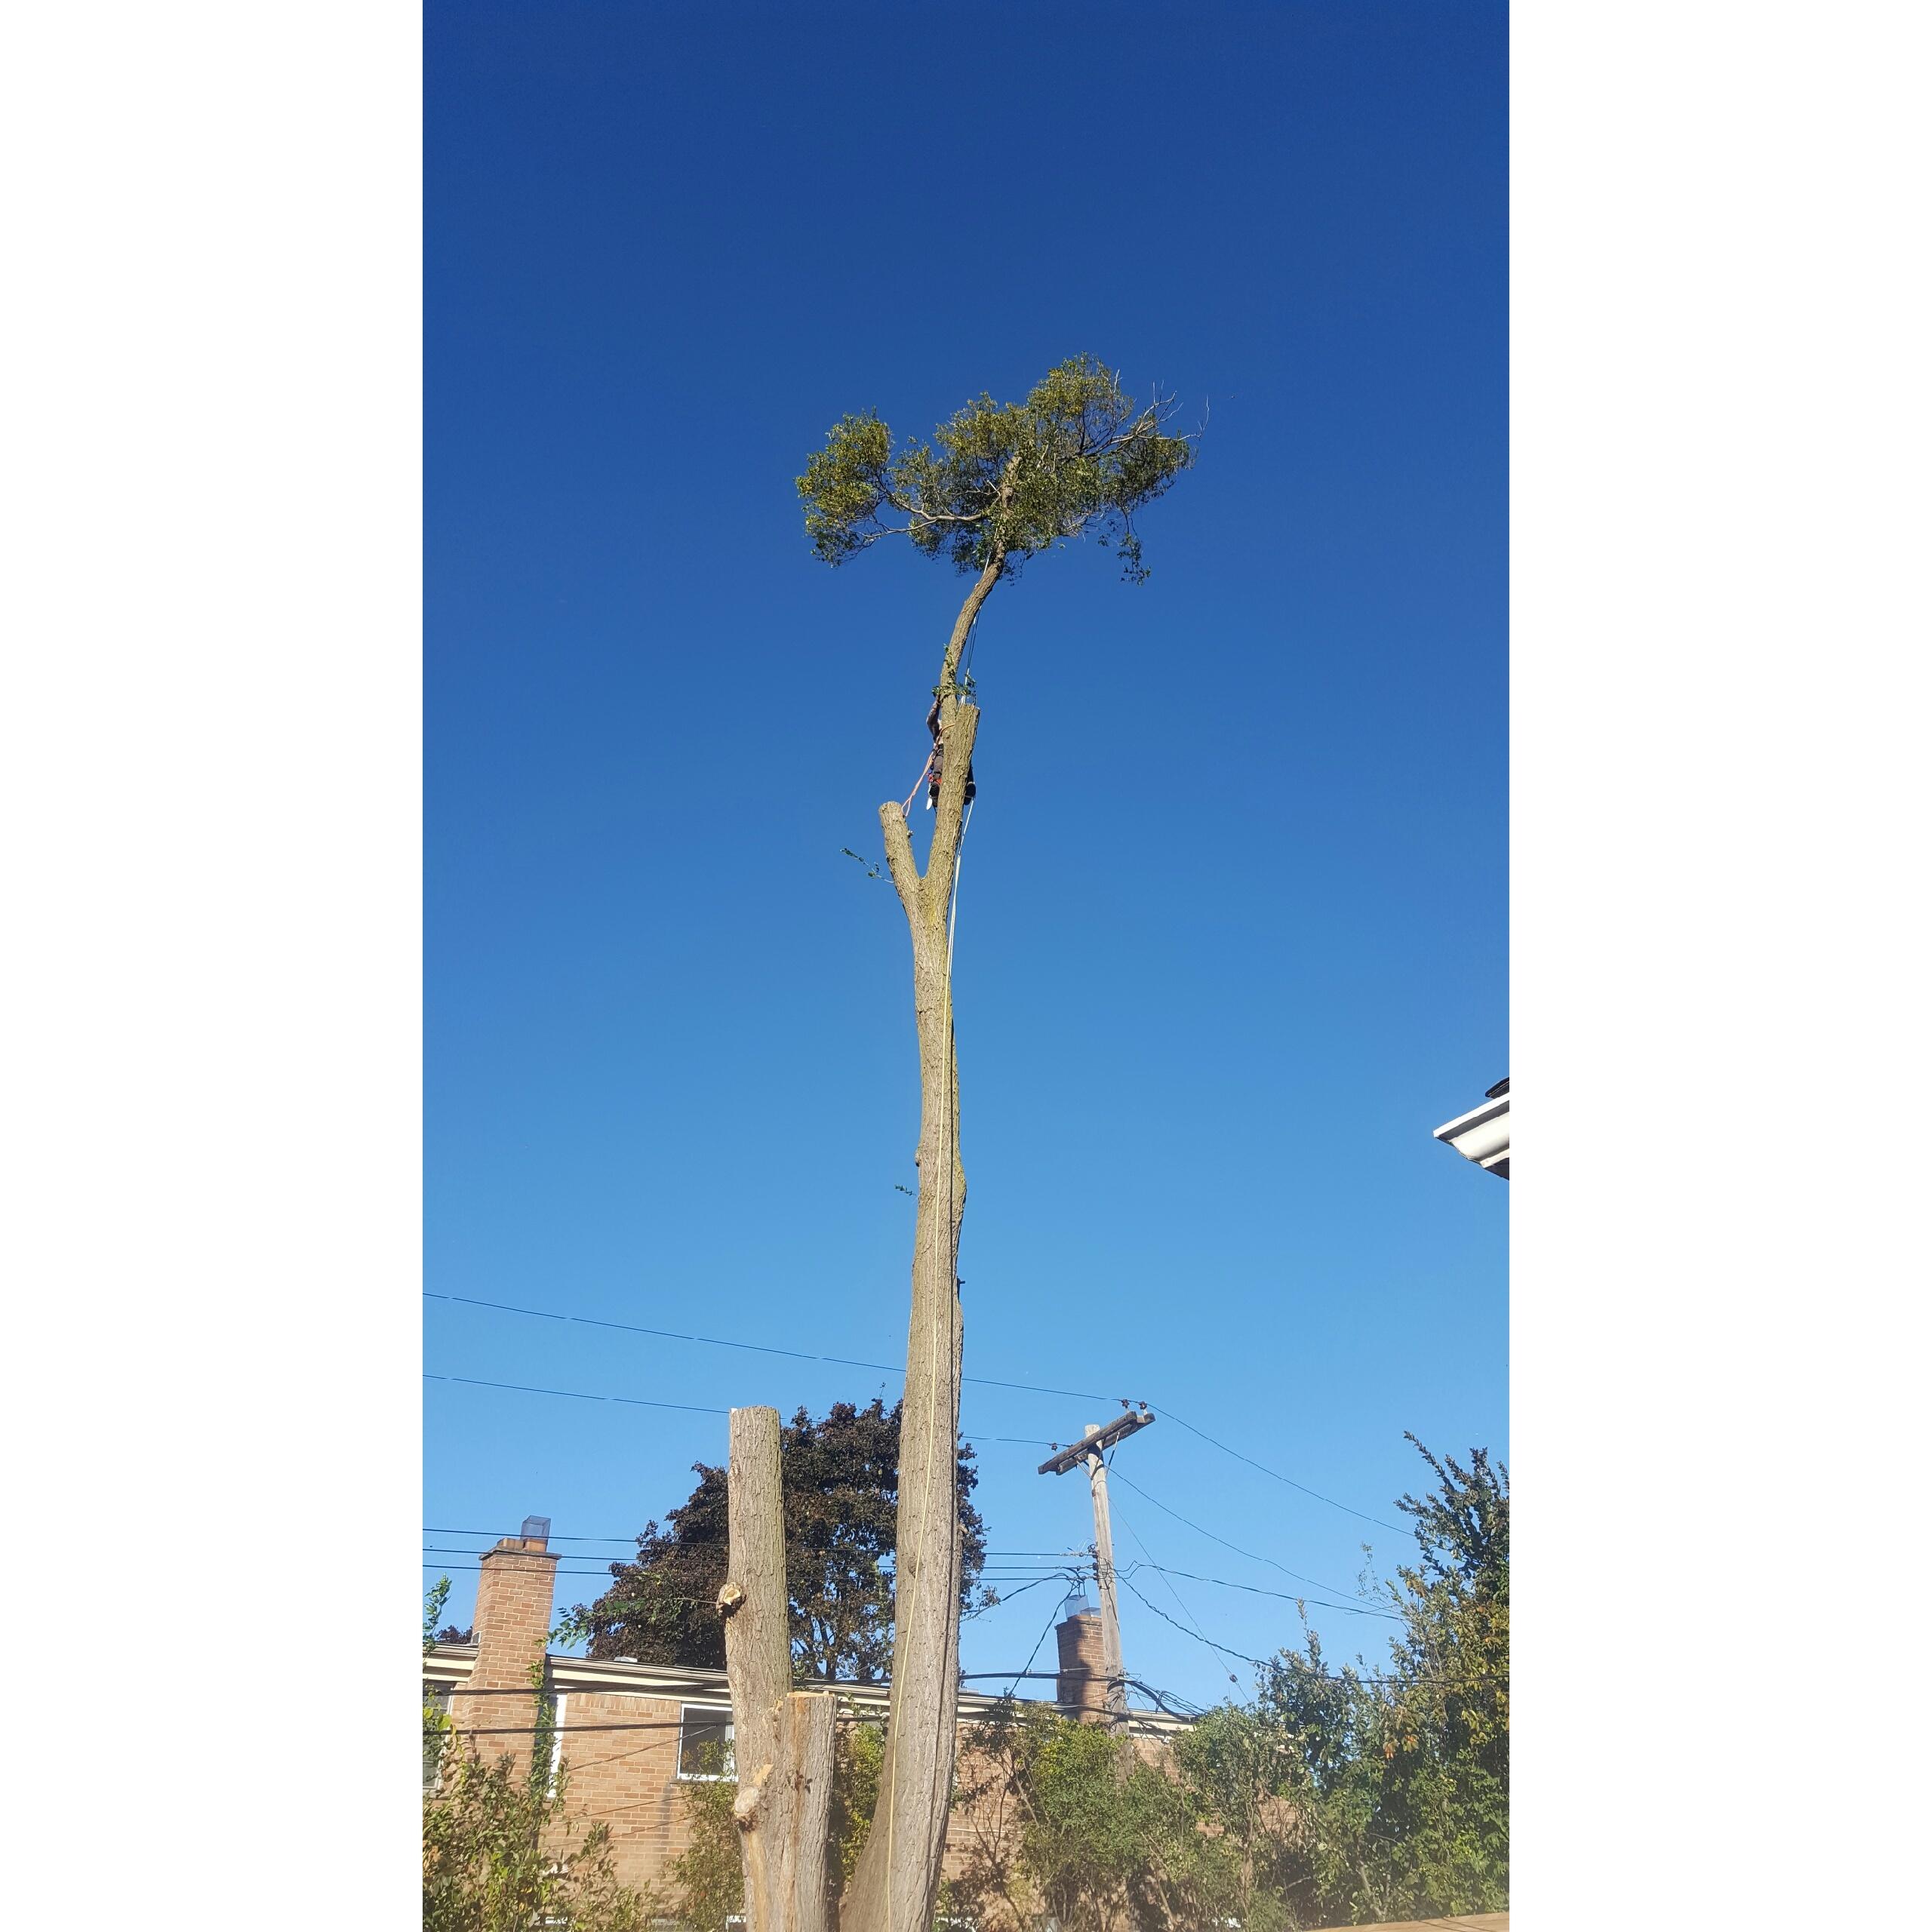 Coffman's Tree Service image 43